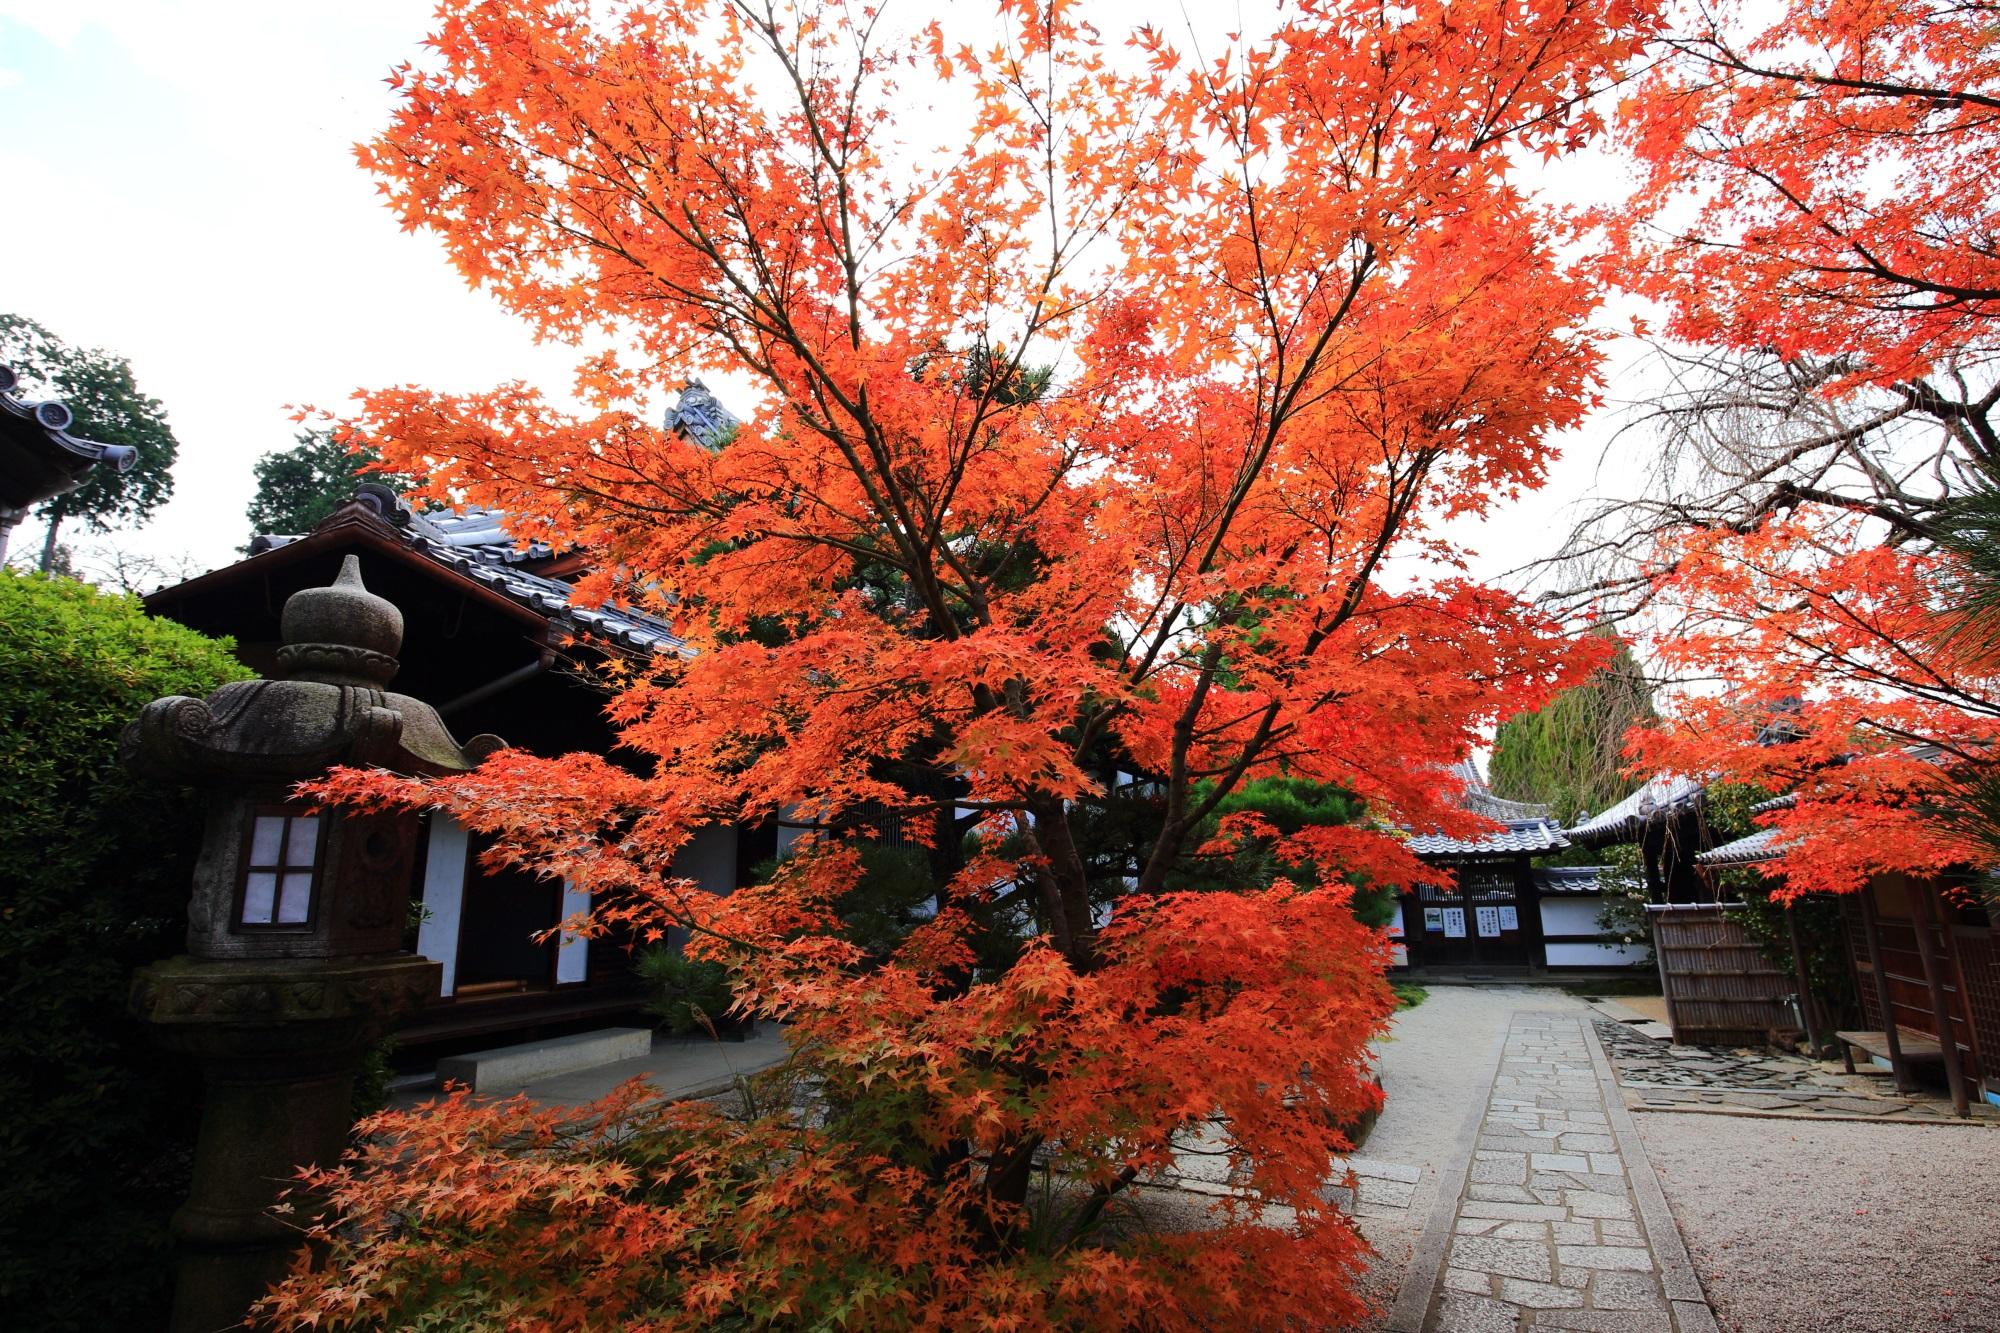 光明院 雲嶺庭 紅葉 見ごろ 秋 東福寺